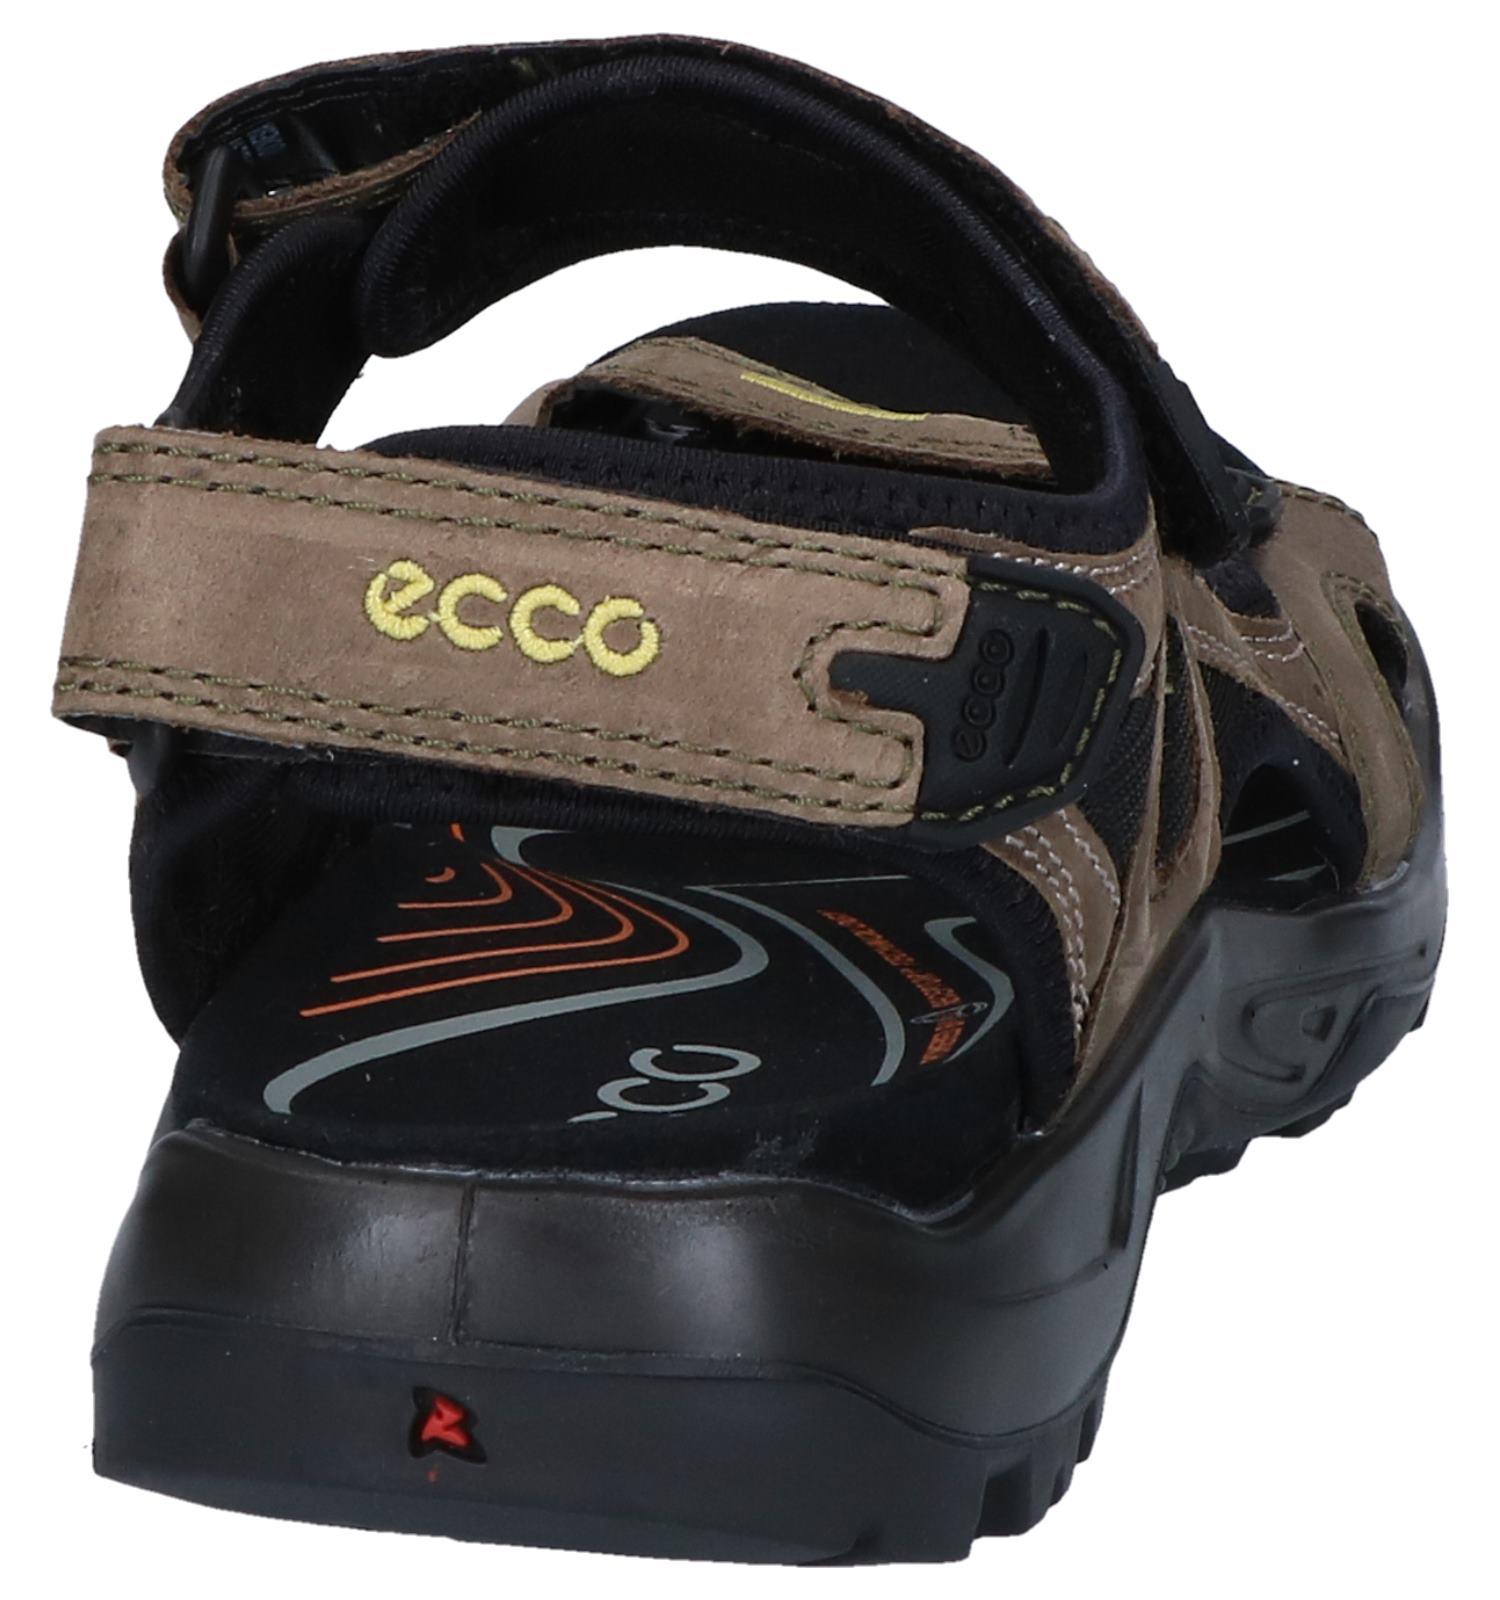 ECCO Offroad Sandalen Bruin   SCHOENENTORFS.NL   Gratis verzend en retour